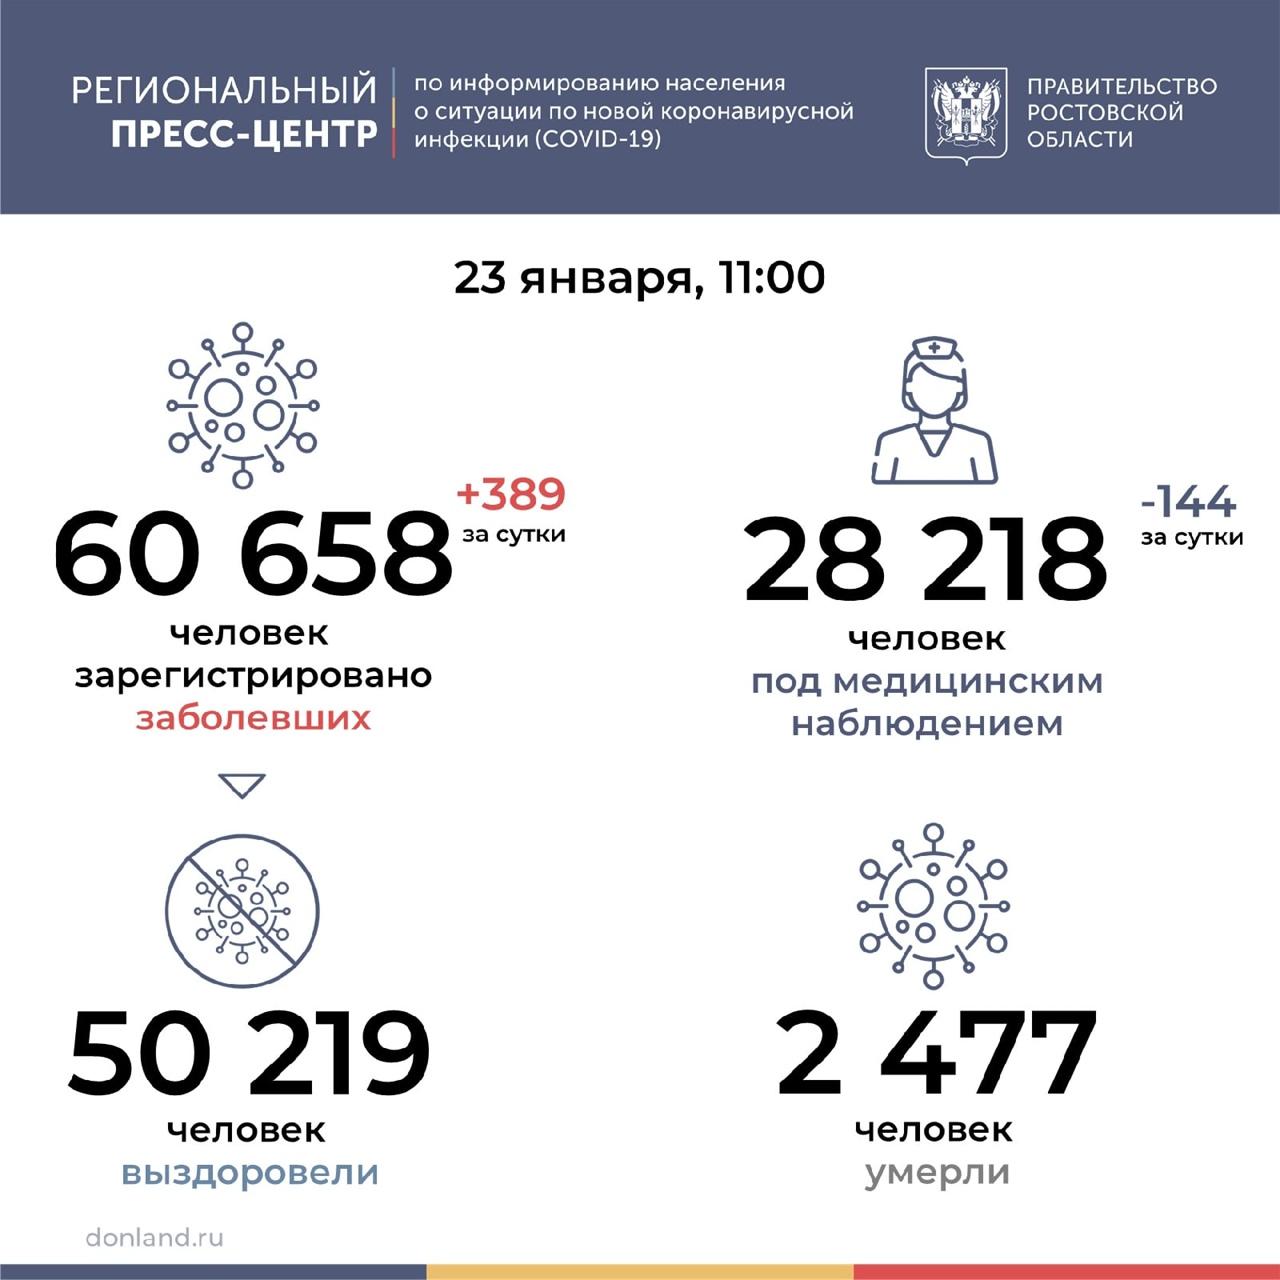 За сутки от коронавируса умерли 29 жителей области